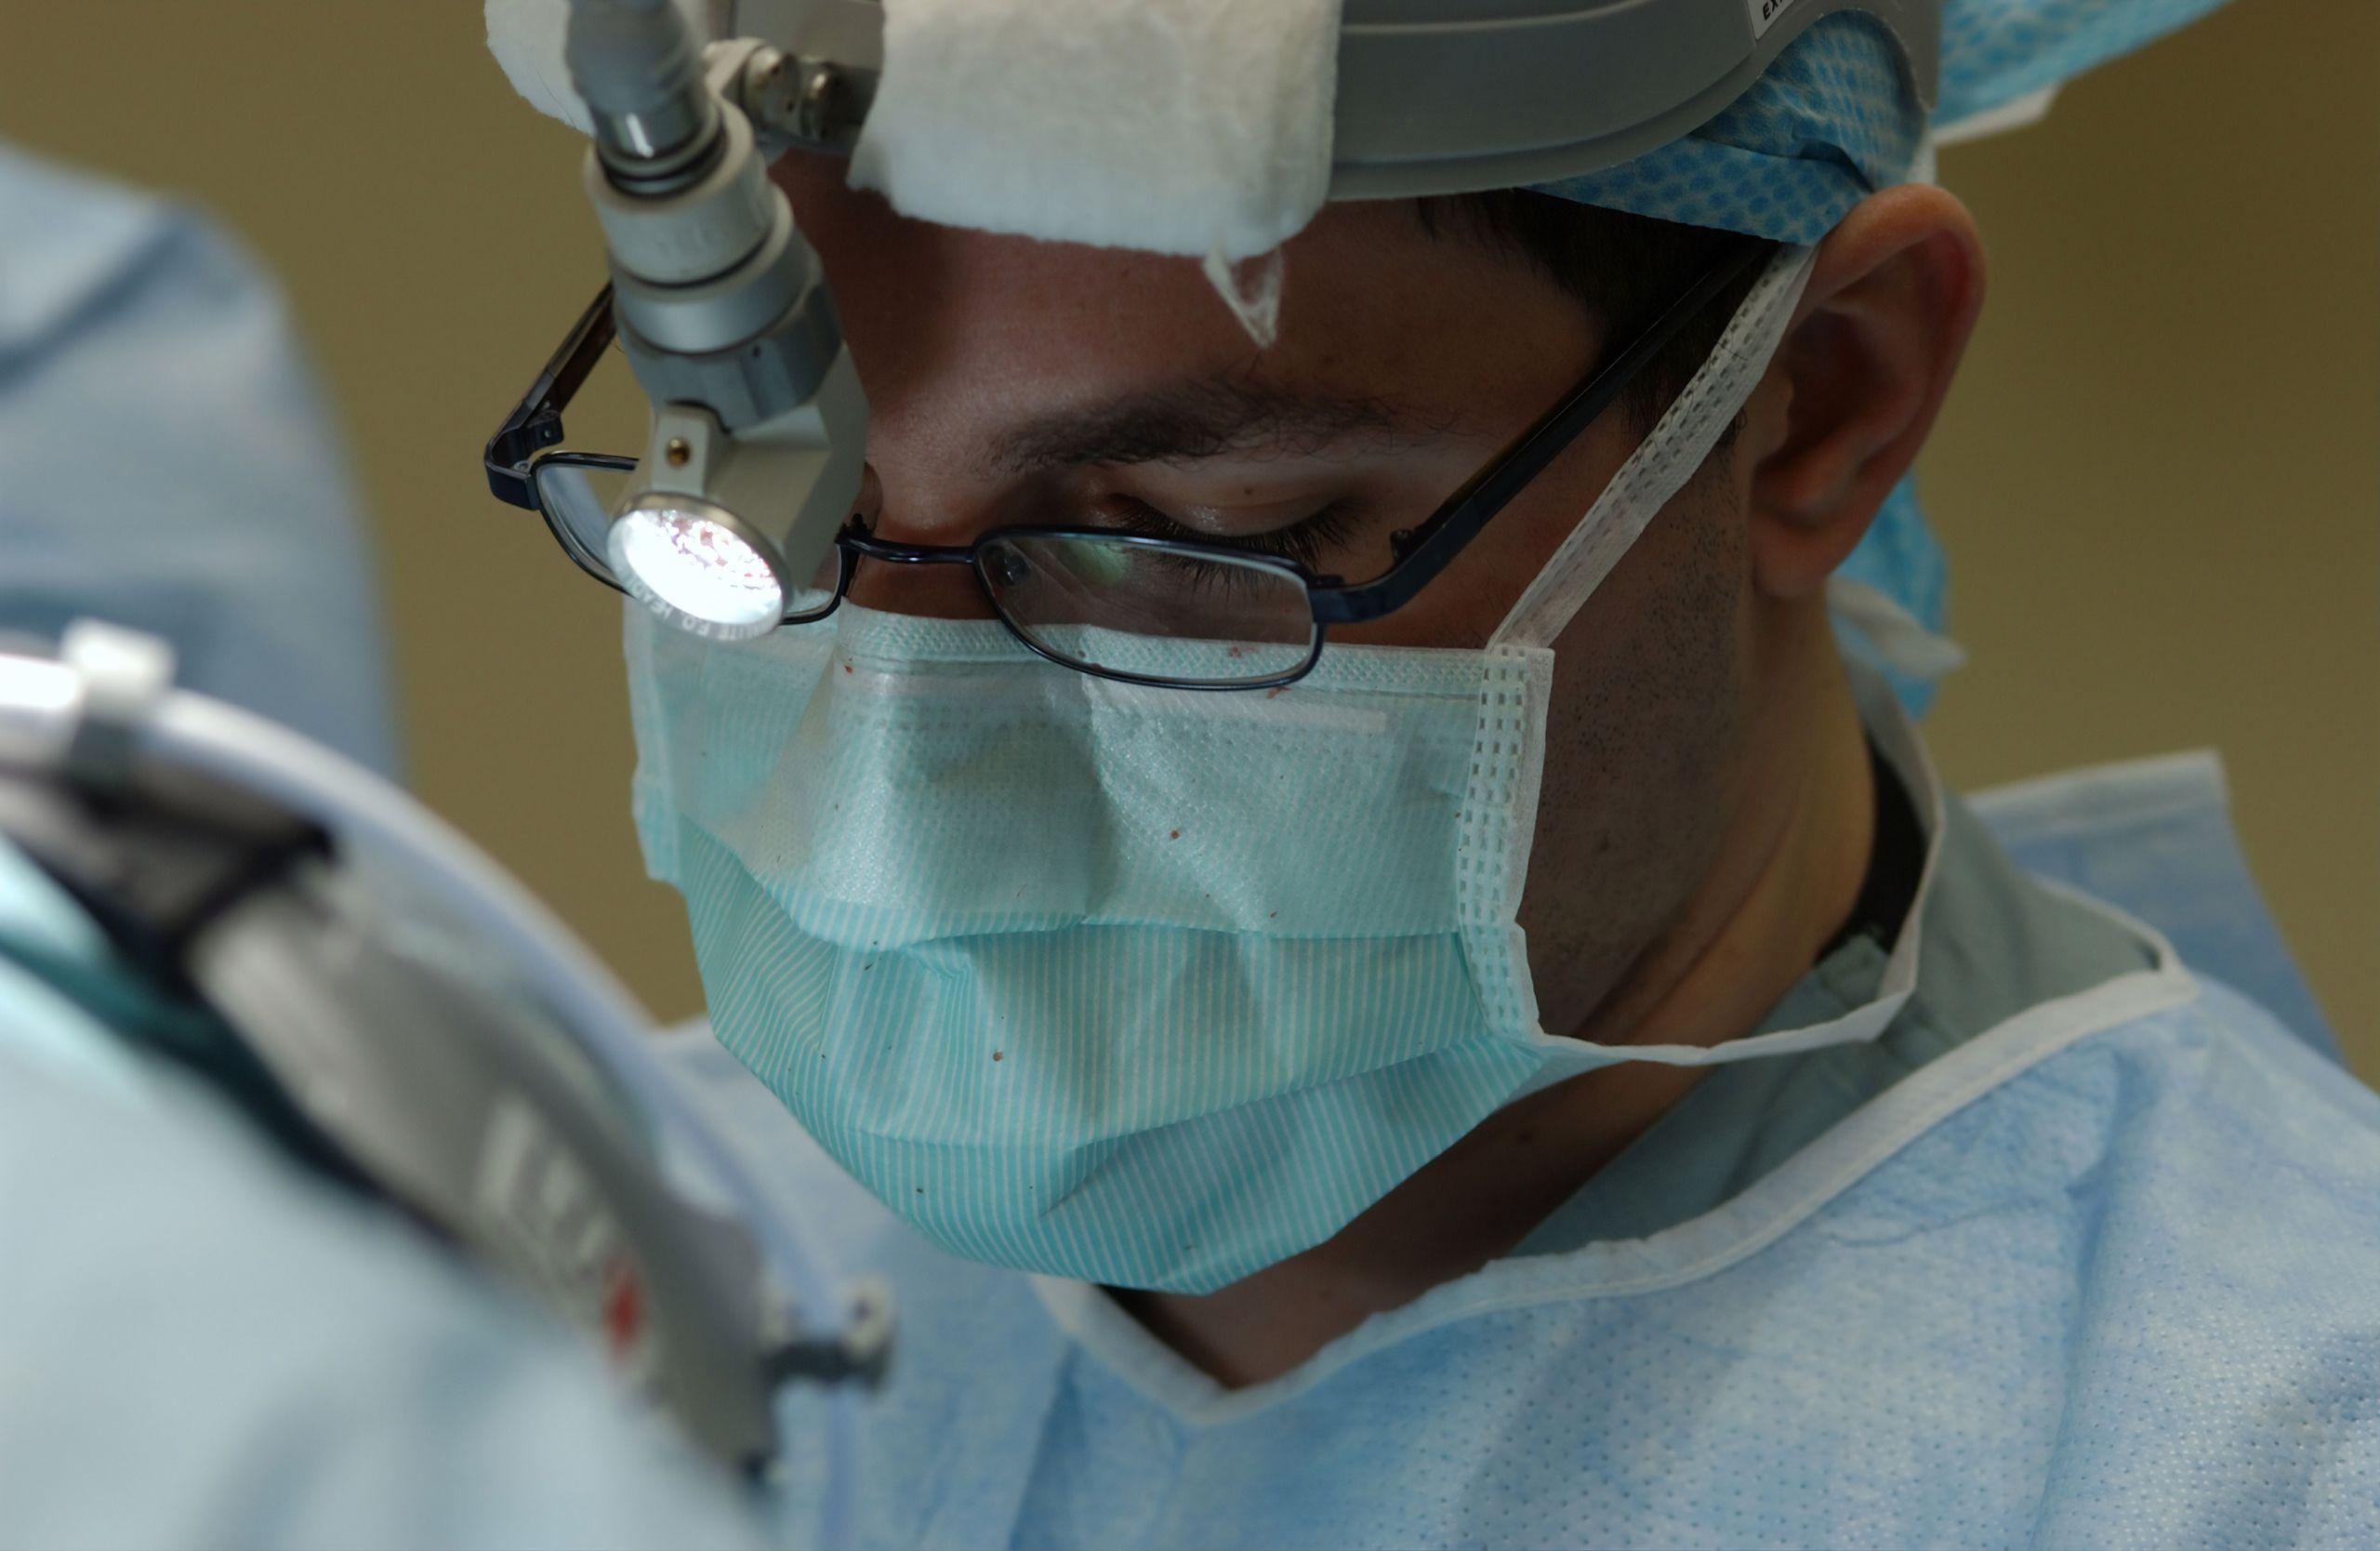 surgeon-wearing-a-mask-during-surgery.jpg